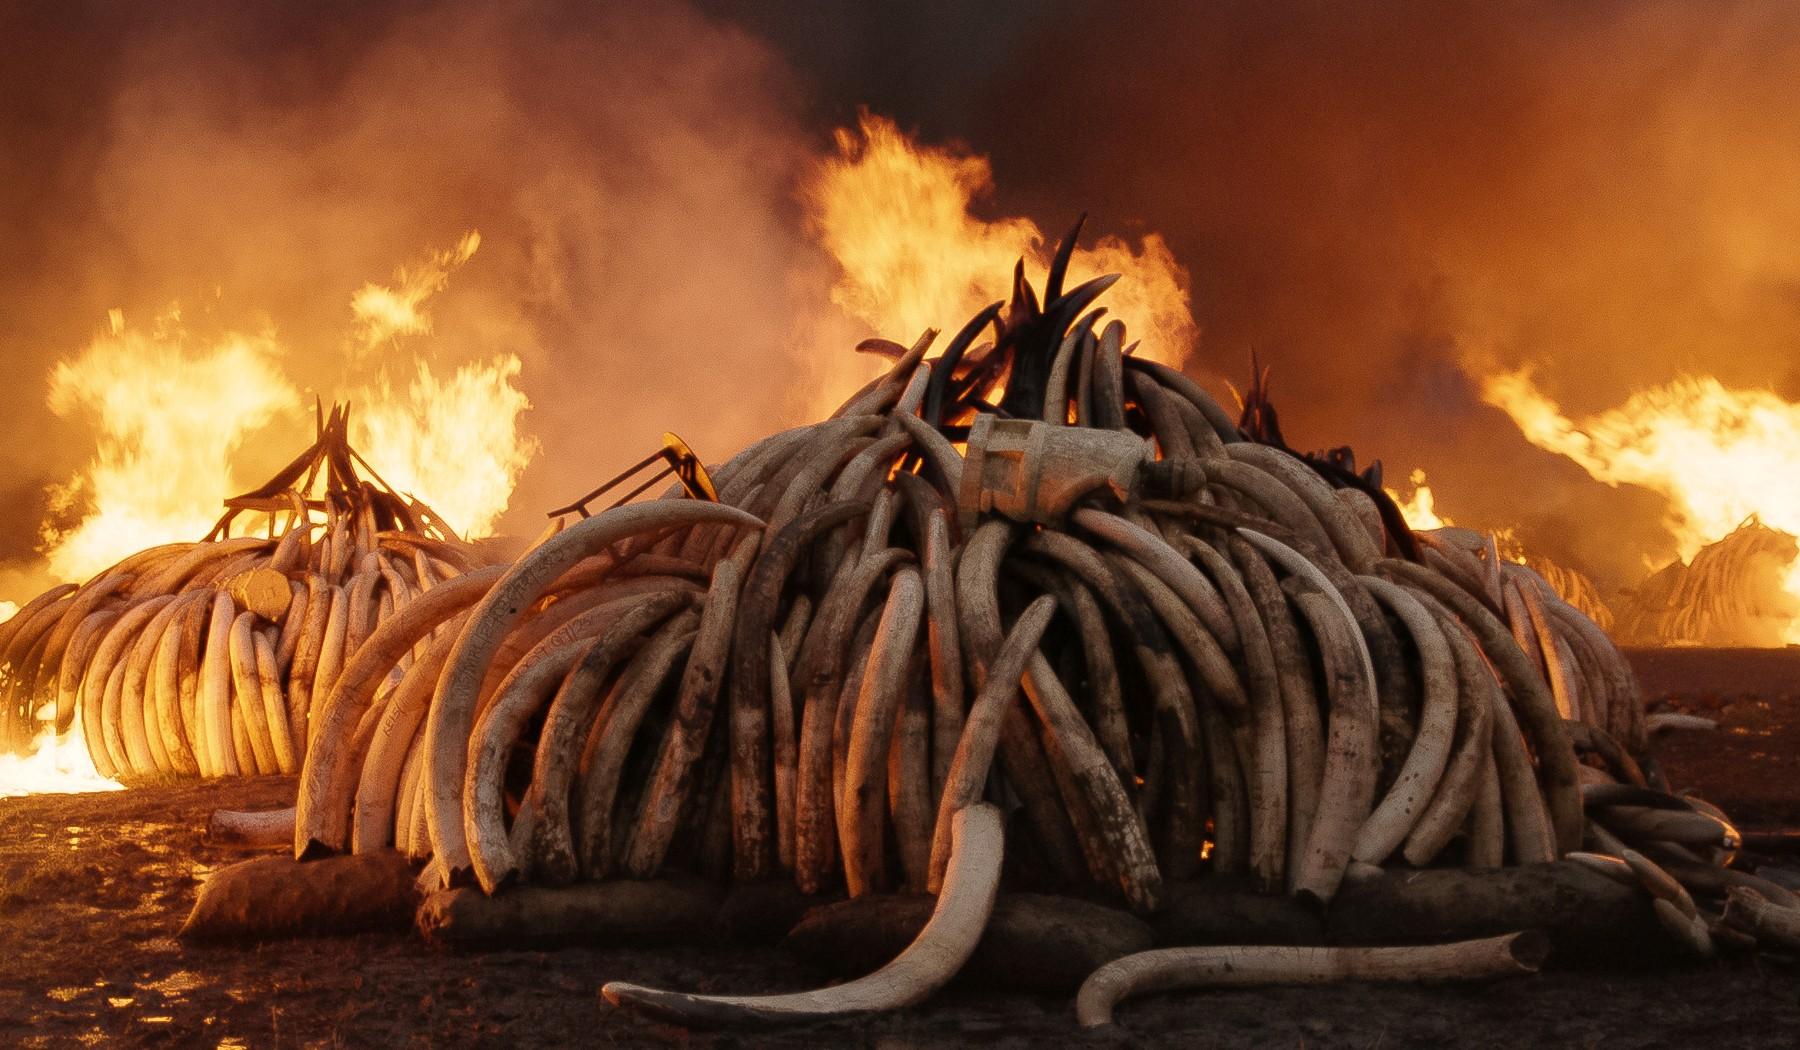 Anthropocene: The Human Epoch των Τζένιφερ Μπάιχβαλ, Έντουαρντ Μπουρτίνσκι, Νικολά ντε Πενσιέ